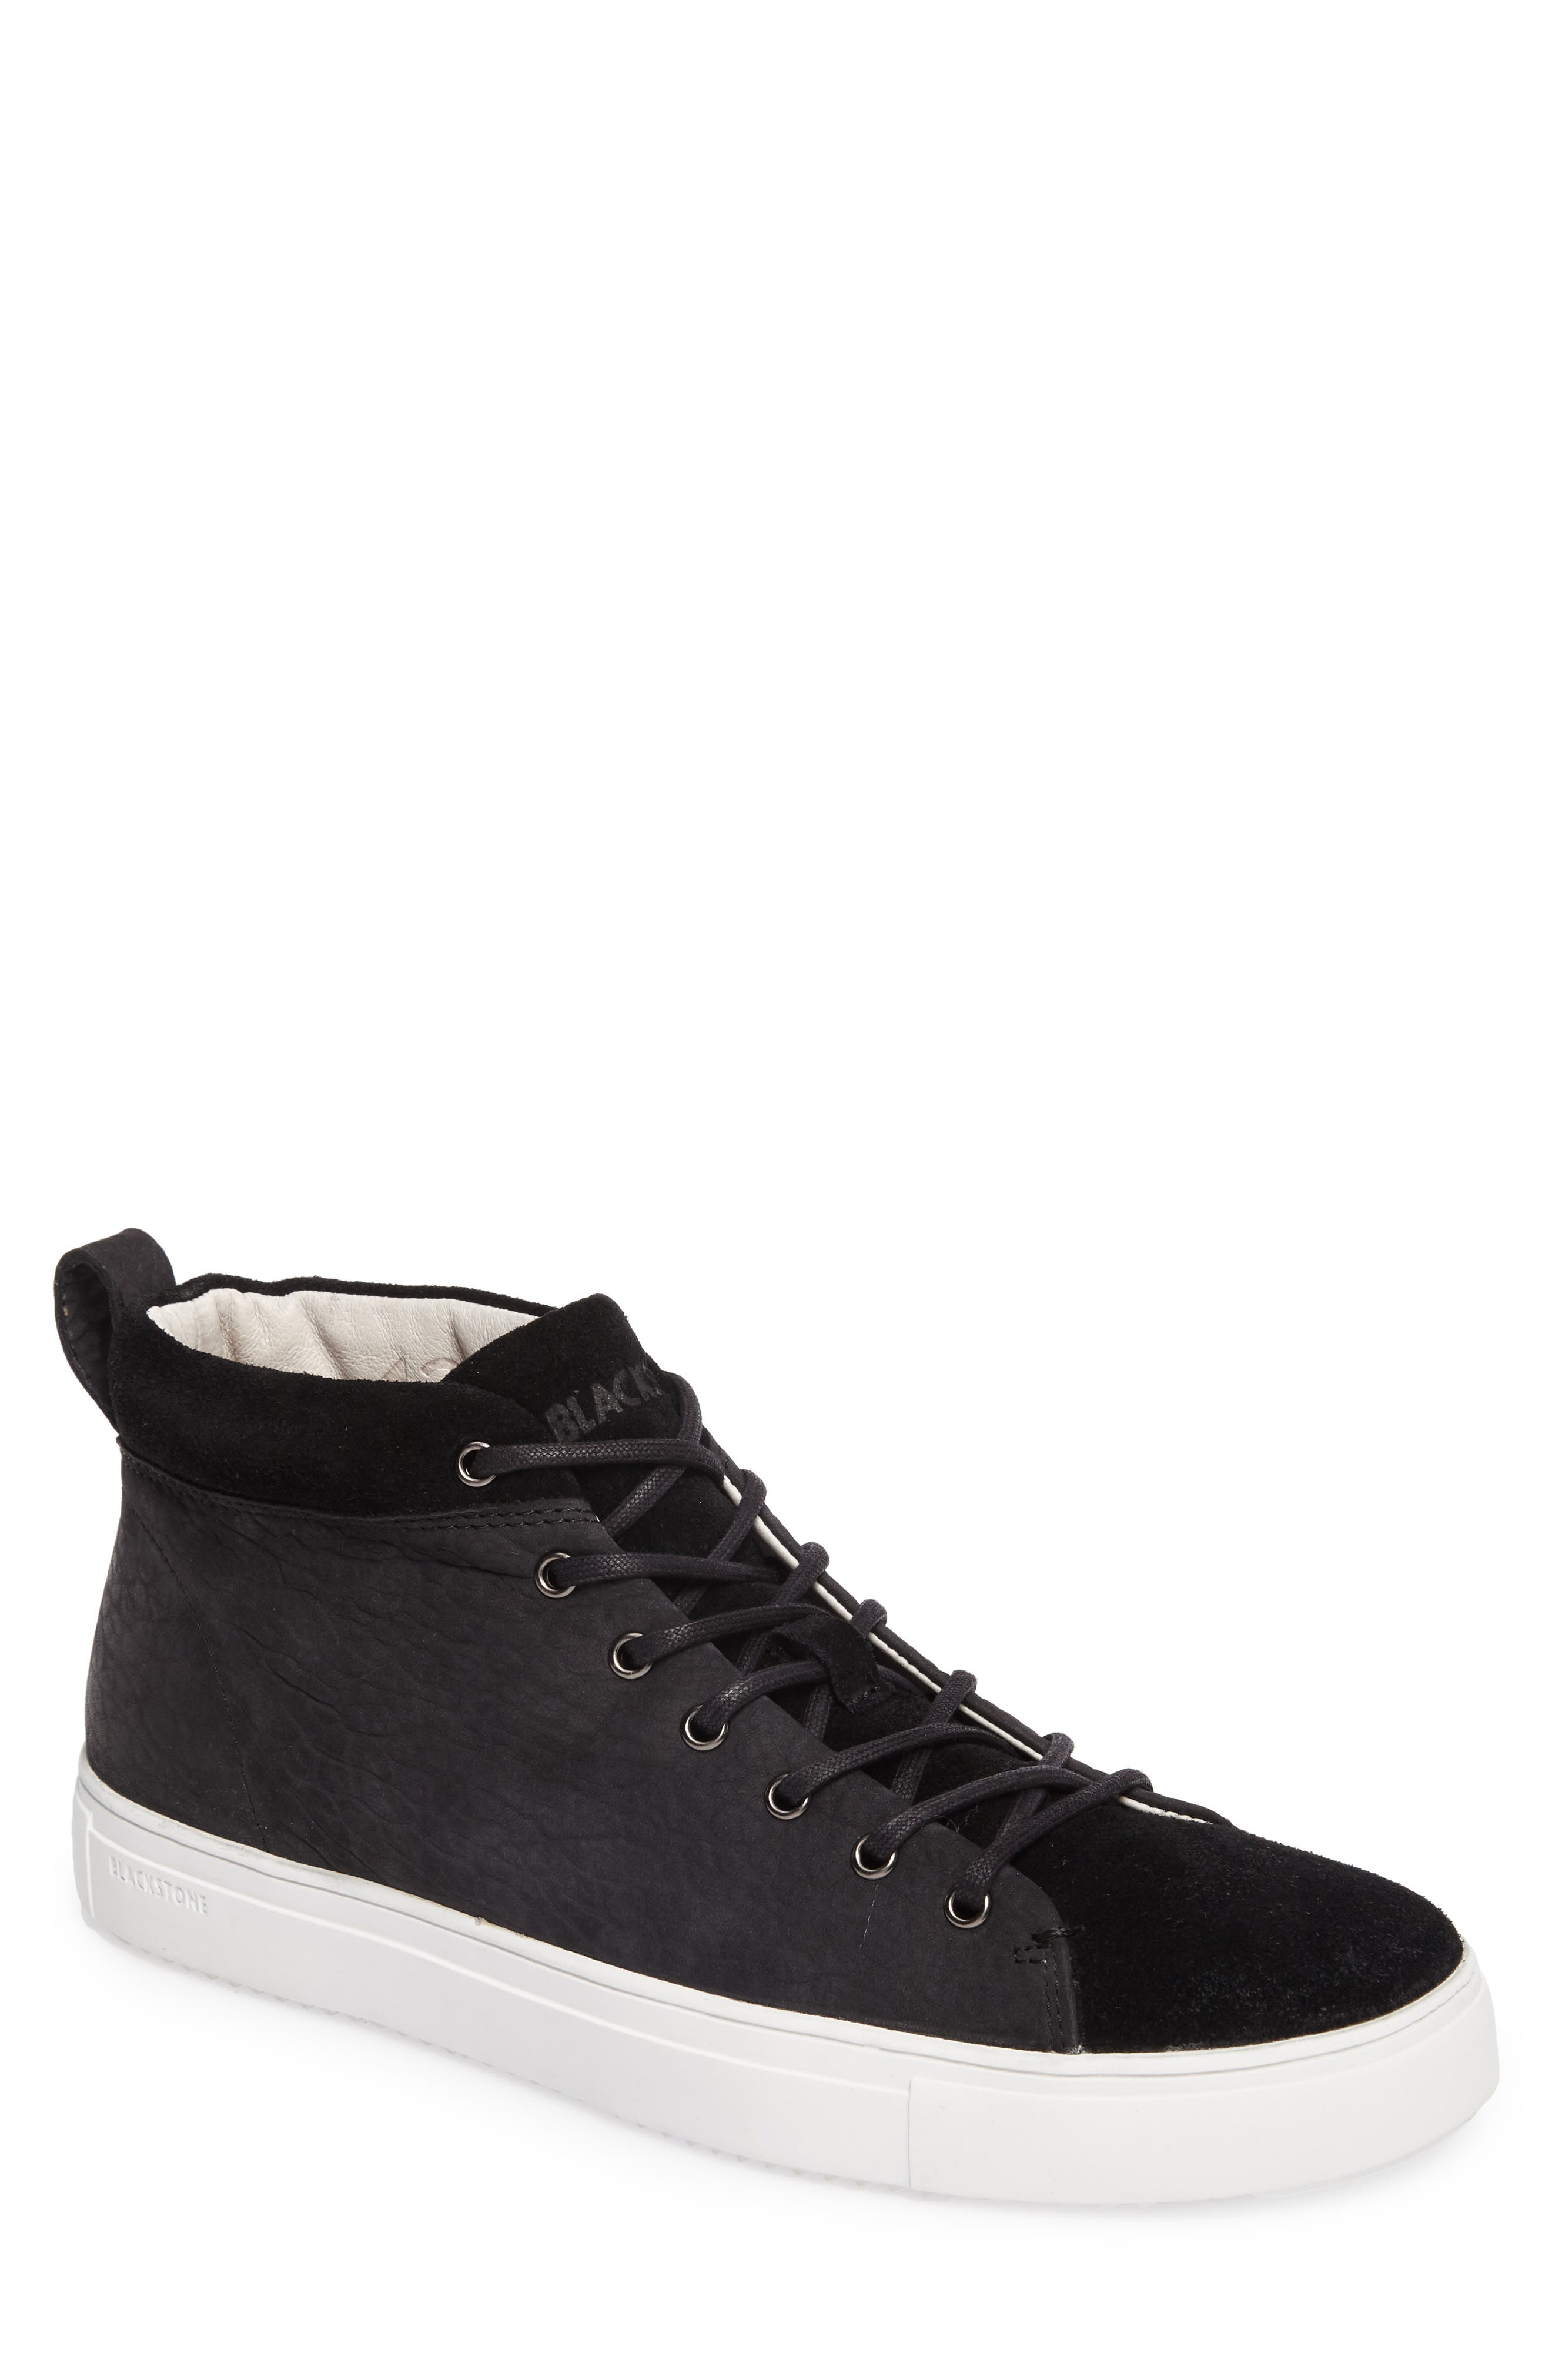 OM 56 Sneaker,                         Main,                         color, BLACK LEATHER